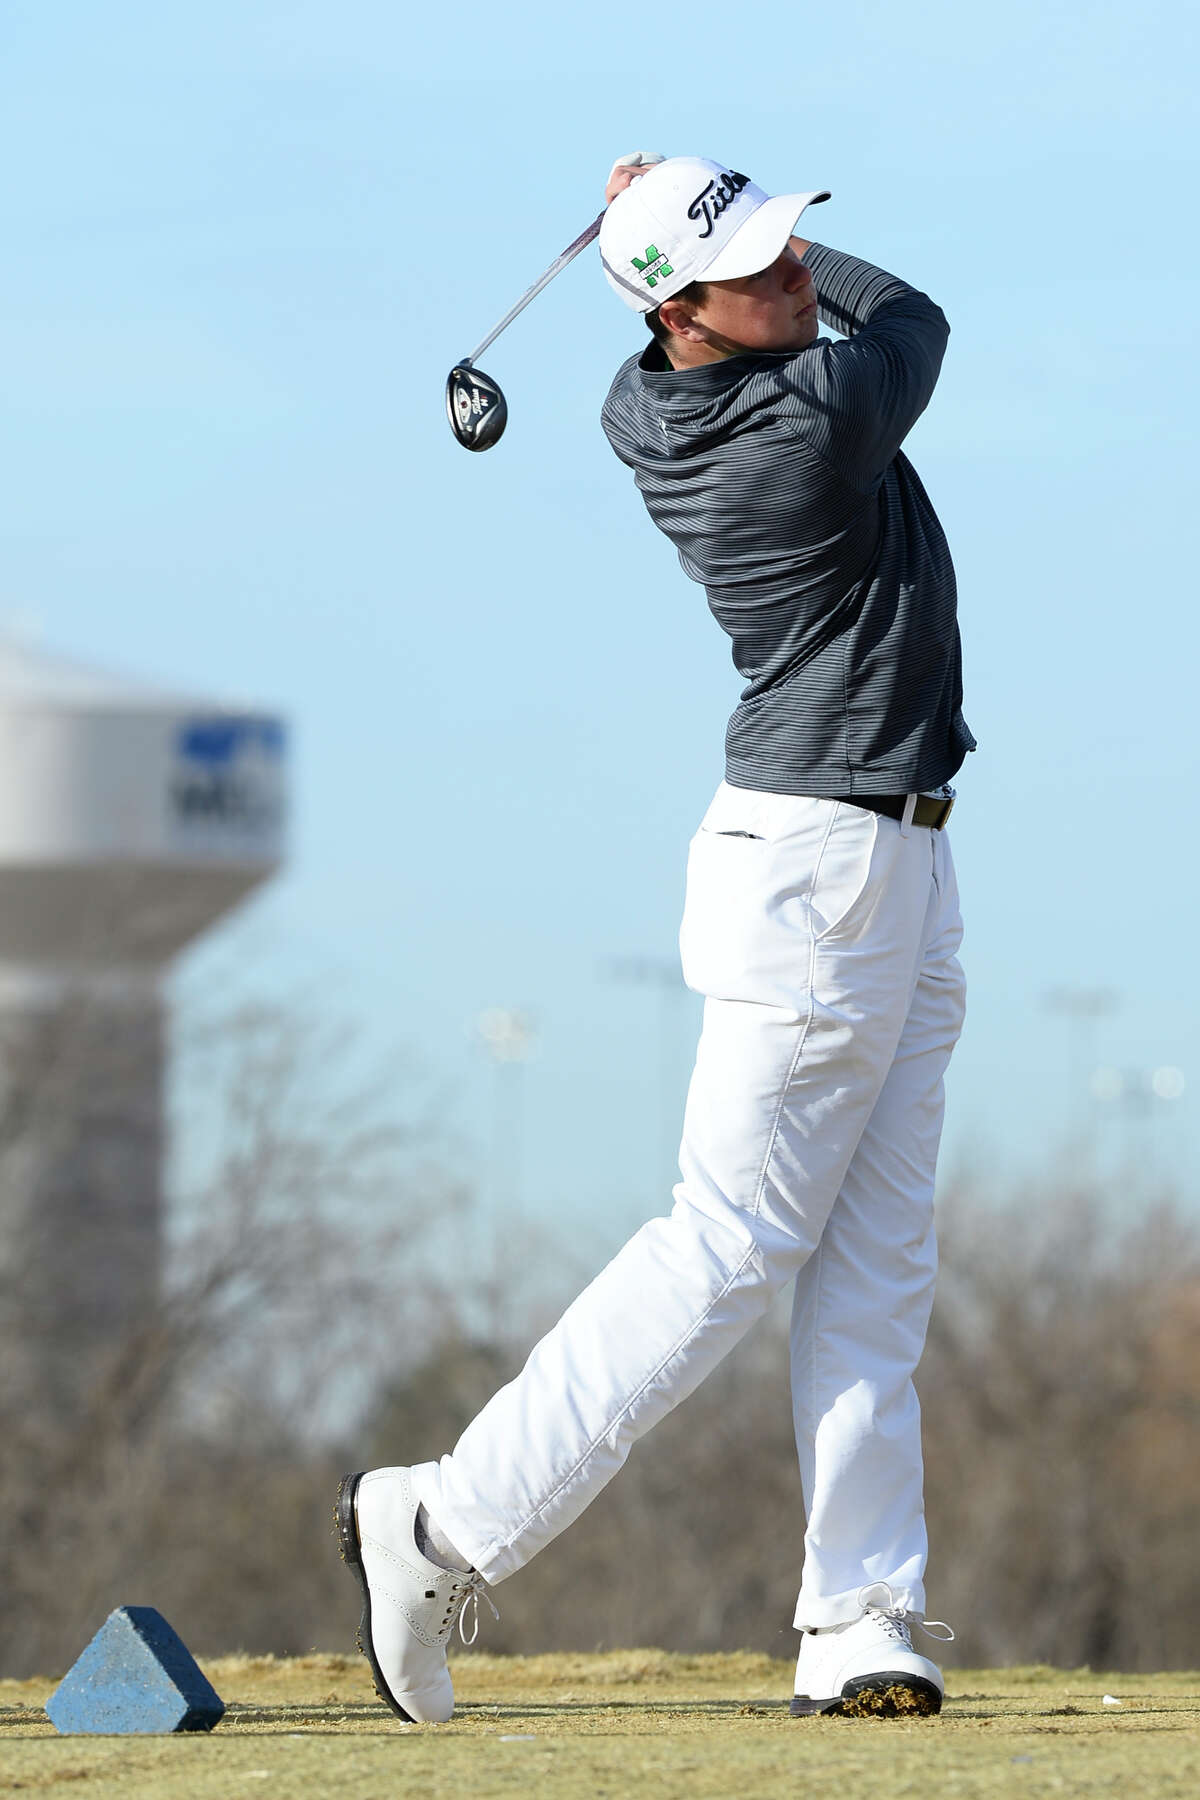 Monahans' Bond Heflin tees off on hole two of the Roadrunner Course during the Boys Tall City Invitational Feb. 17, 2018, at Hogan Park Golf Course. James Durbin/Reporter-Telegram